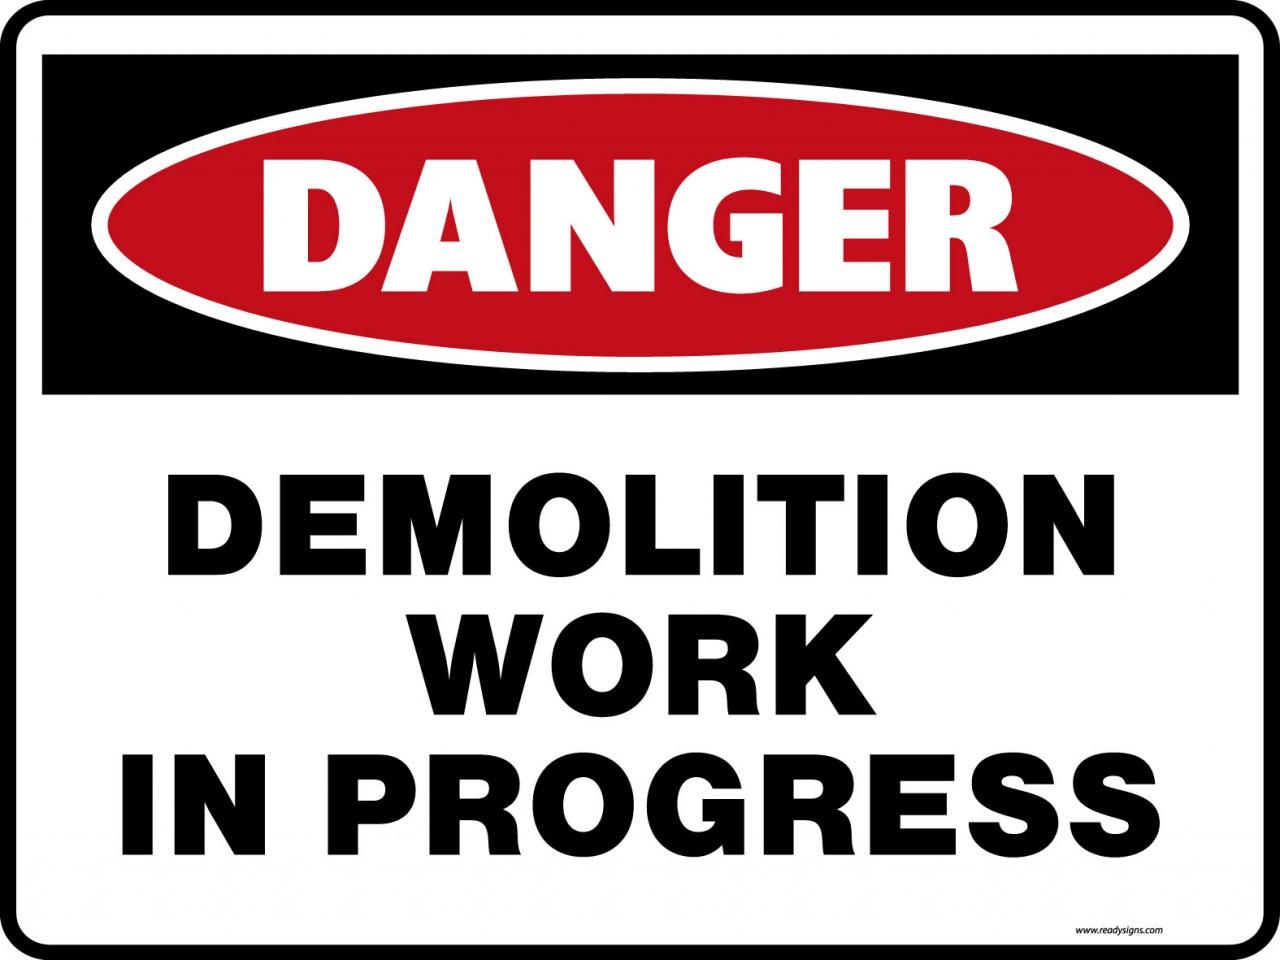 Danger Signs - Demolition Work in Progress - Ready Signs